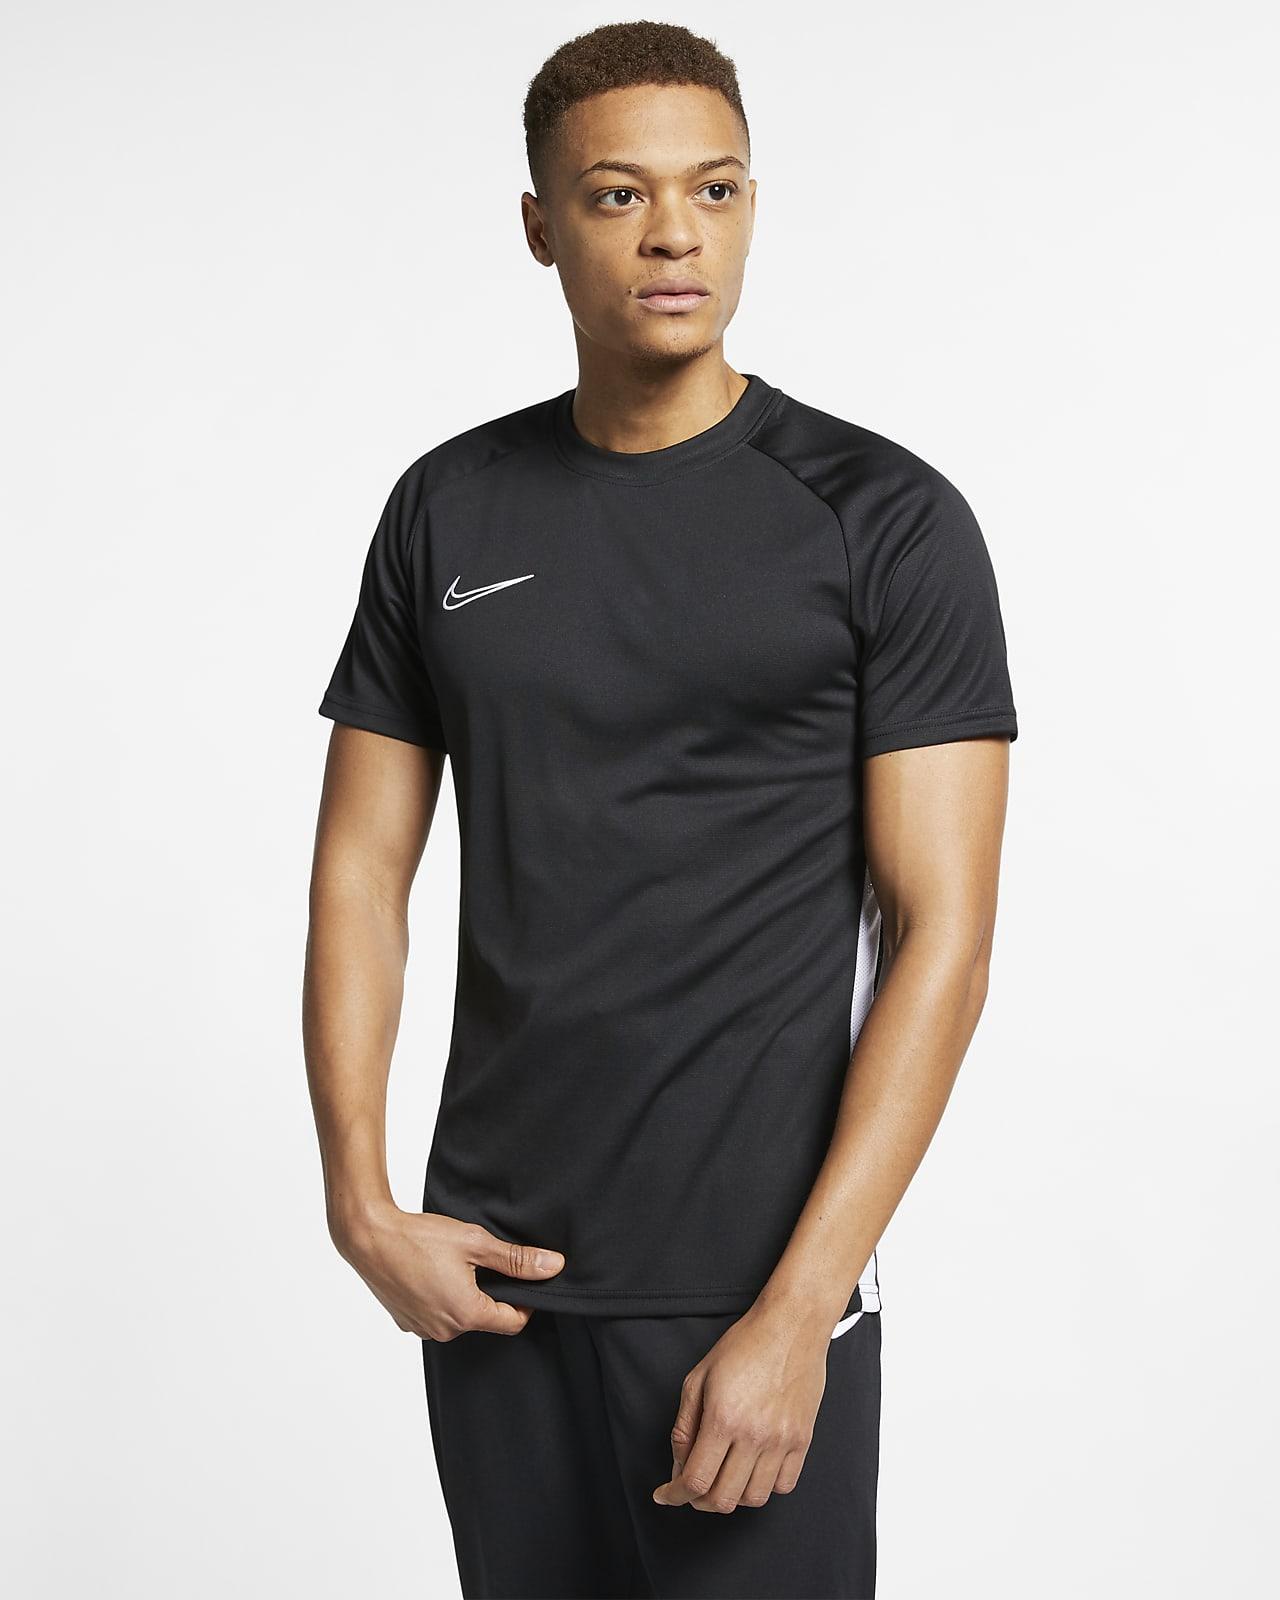 Nike Dri-FIT Academy Kısa Kollu Erkek Futbol Üstü